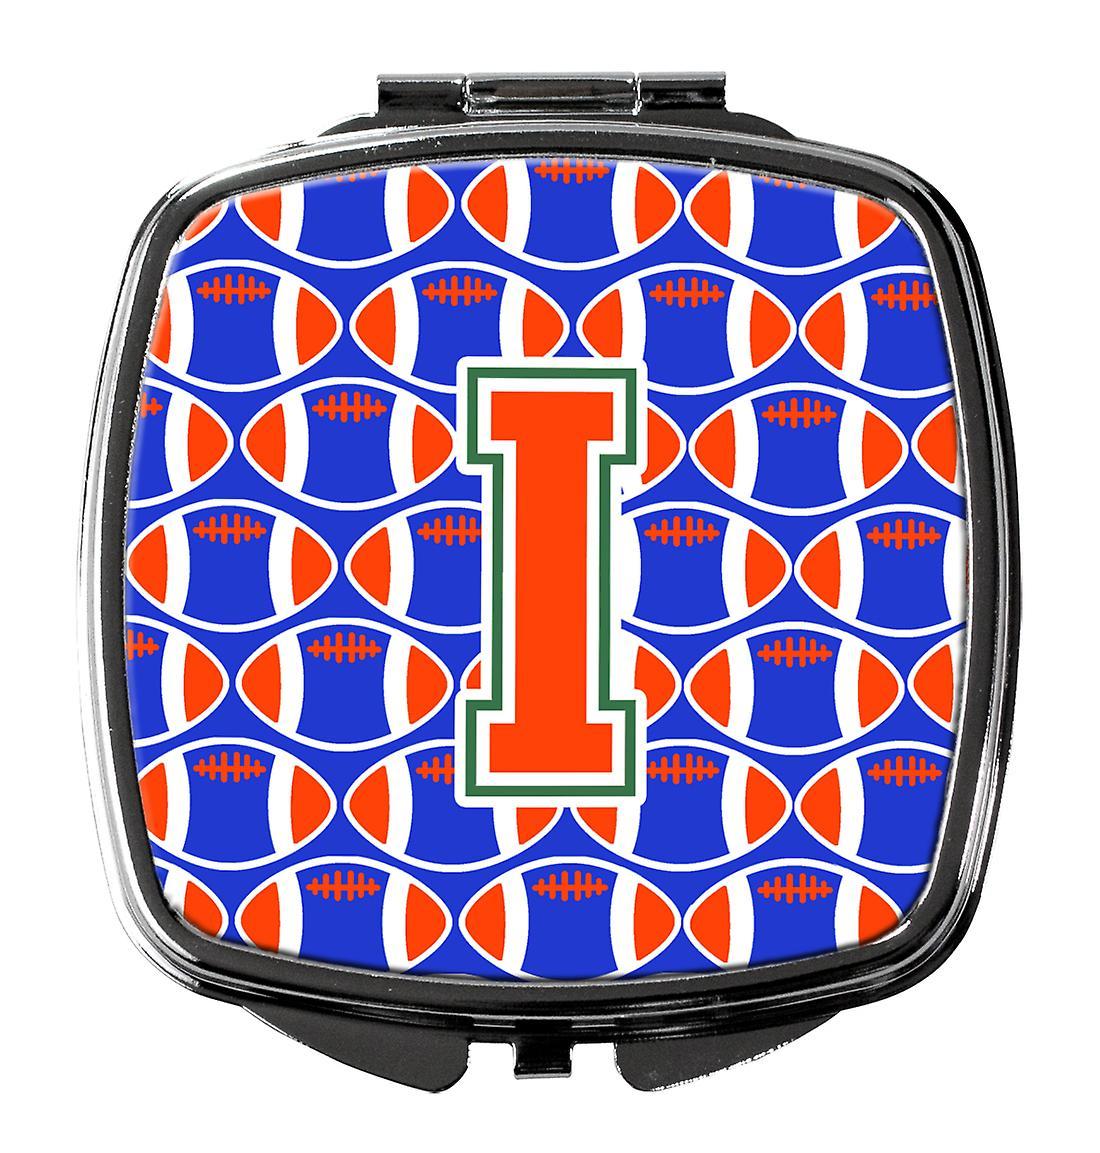 VertBleu Miroir Football Lettre Orange Et Compact I 6vbgyYf7